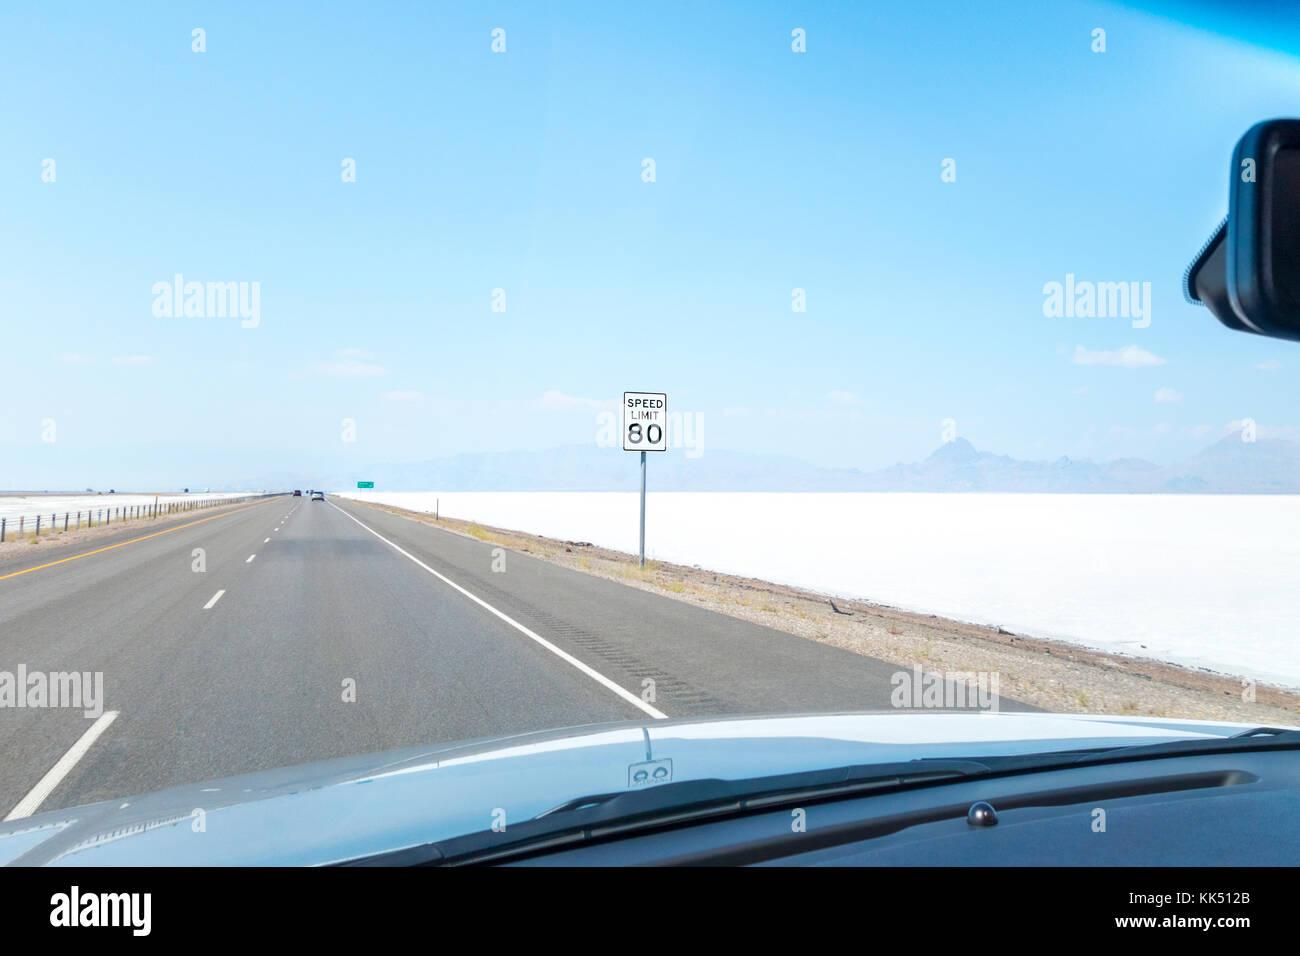 https://c7.alamy.com/comp/KK512B/highway-speed-limit-80-mph-sign-on-the-i-80-west-through-bonneville-KK512B.jpg